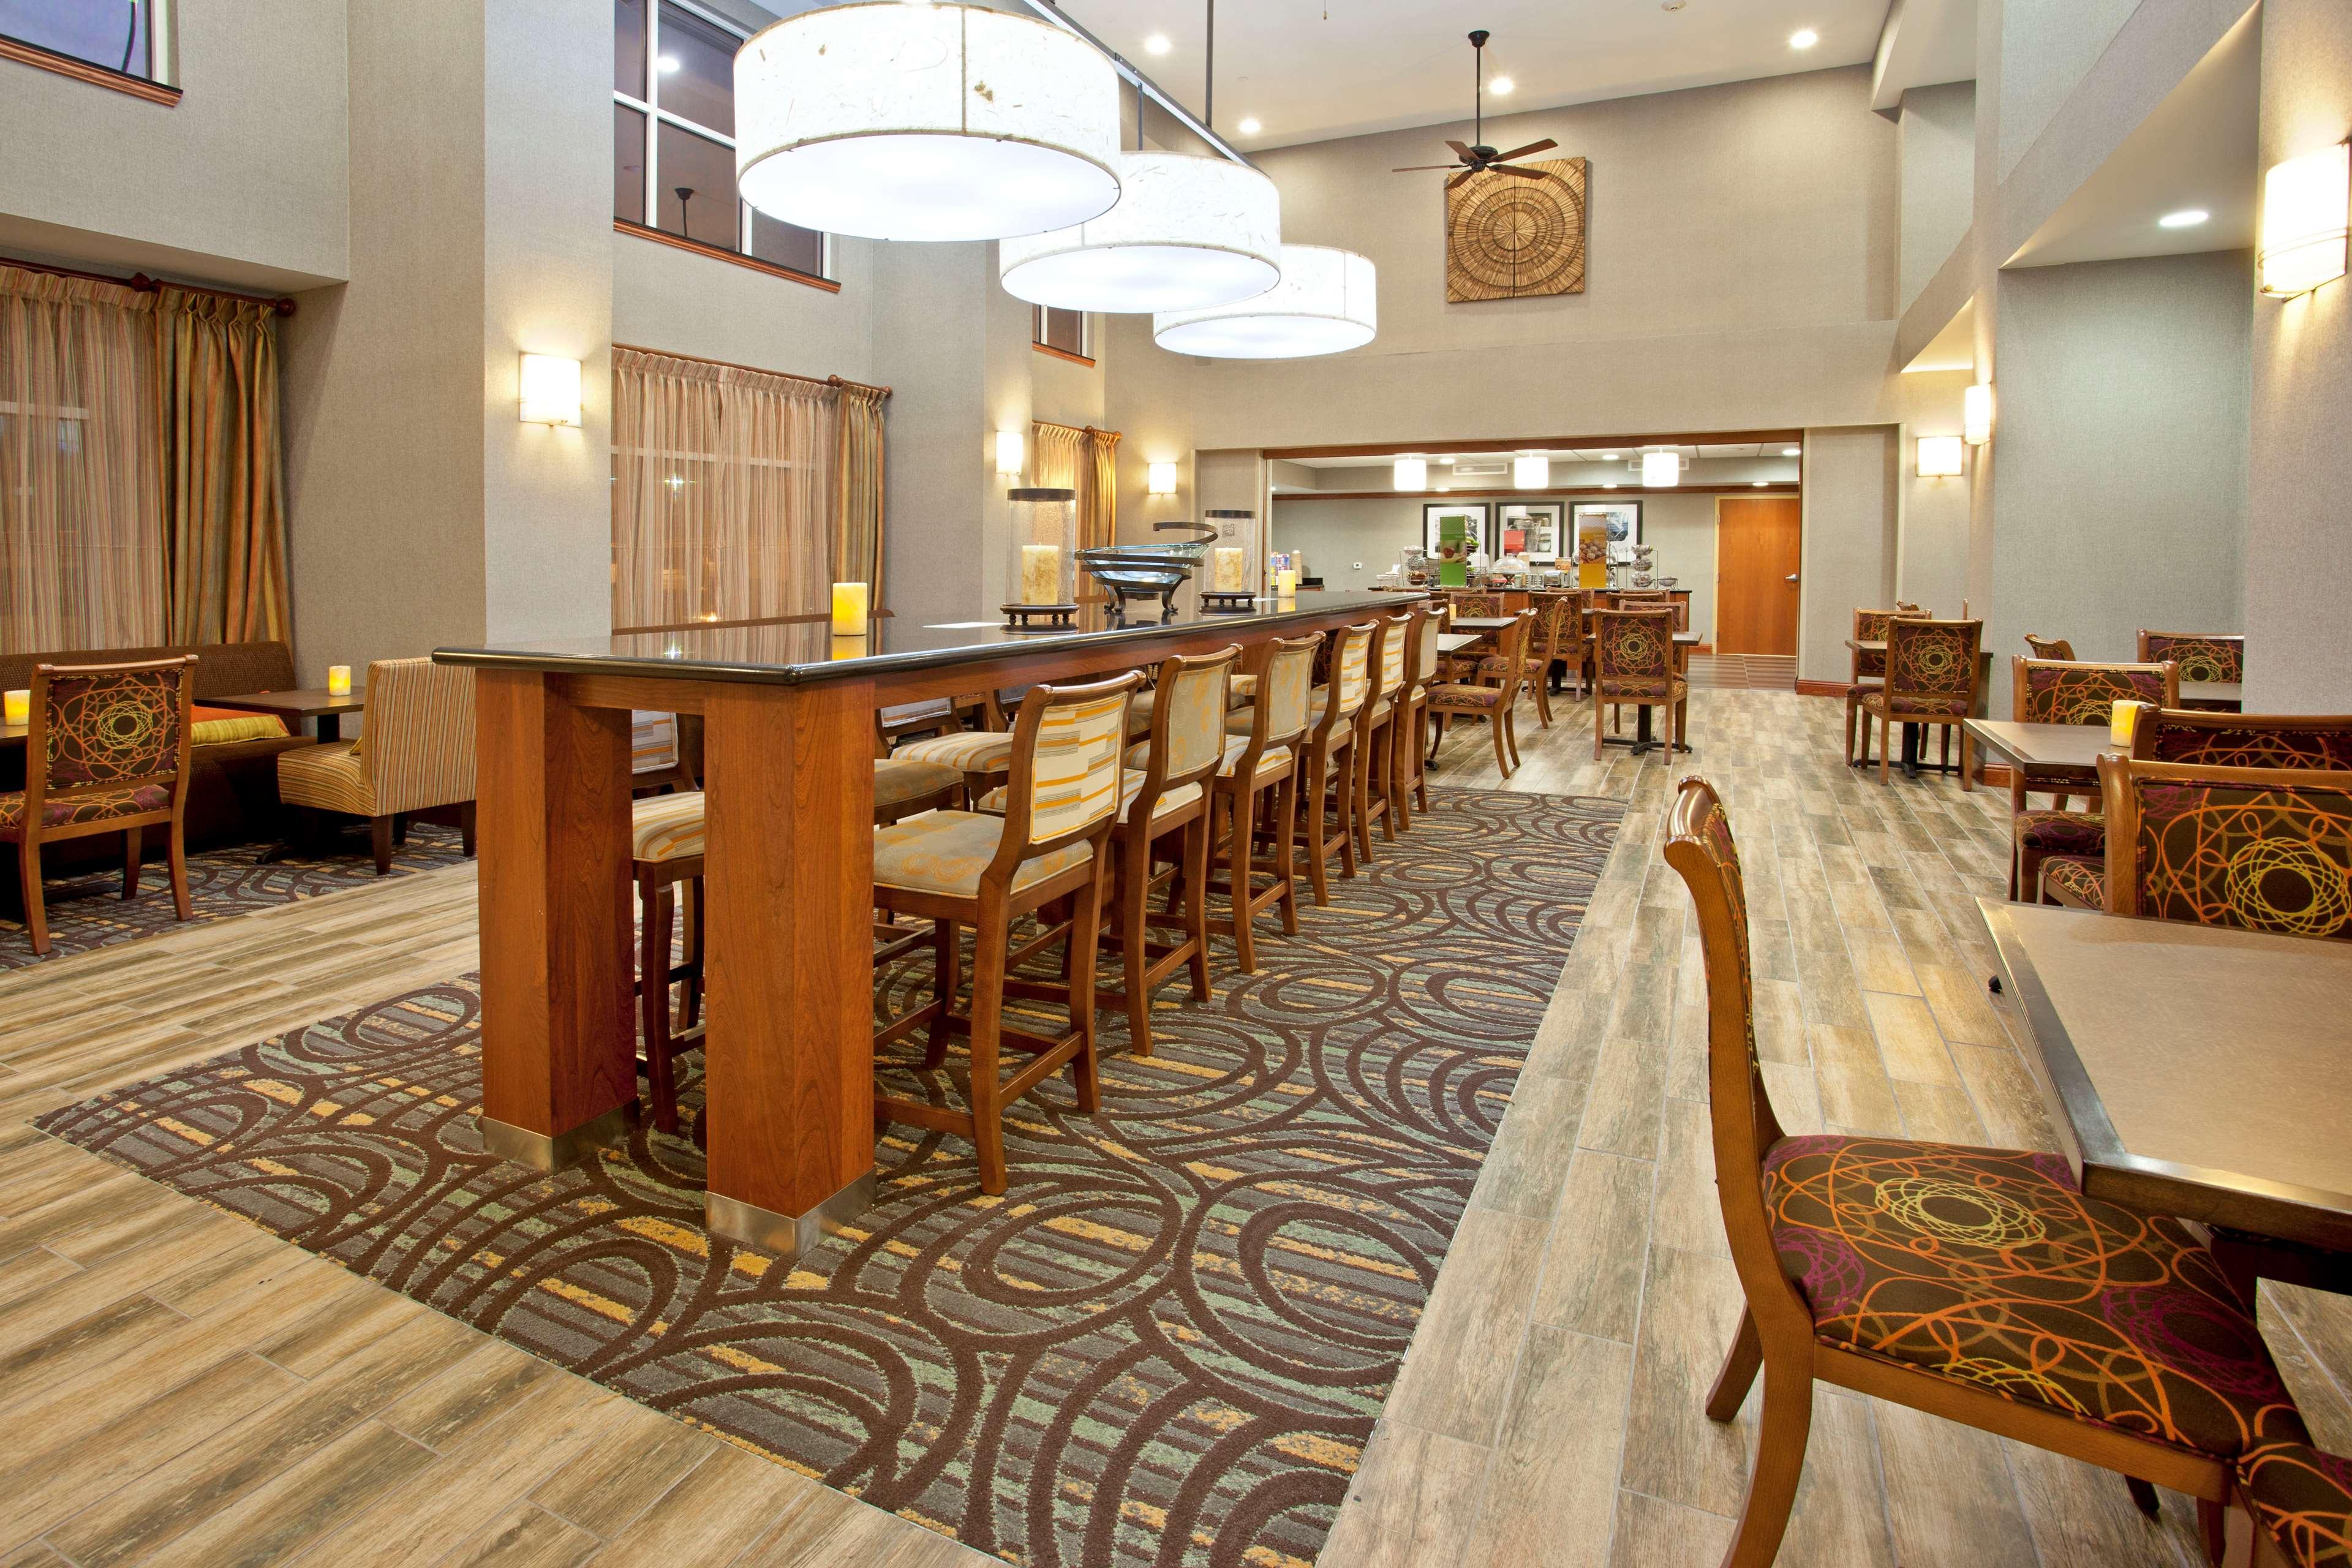 Hampton Inn & Suites Fort Worth-West-I-30 image 11